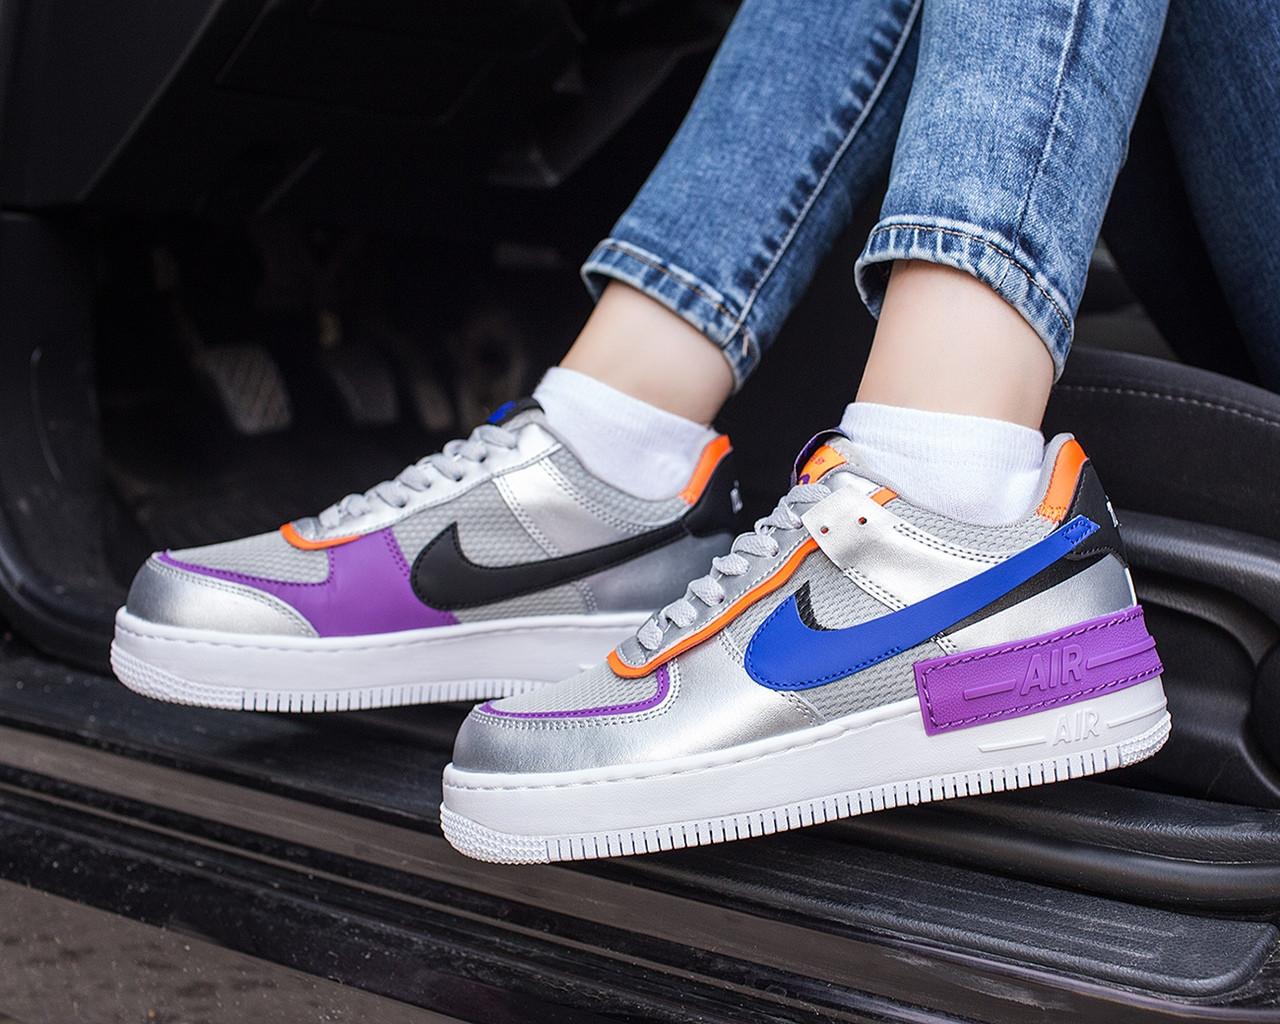 Nike Air Force 1 Shadow Женские осенние серые кожаные кроссовки. Женские кроссовки на шнурках